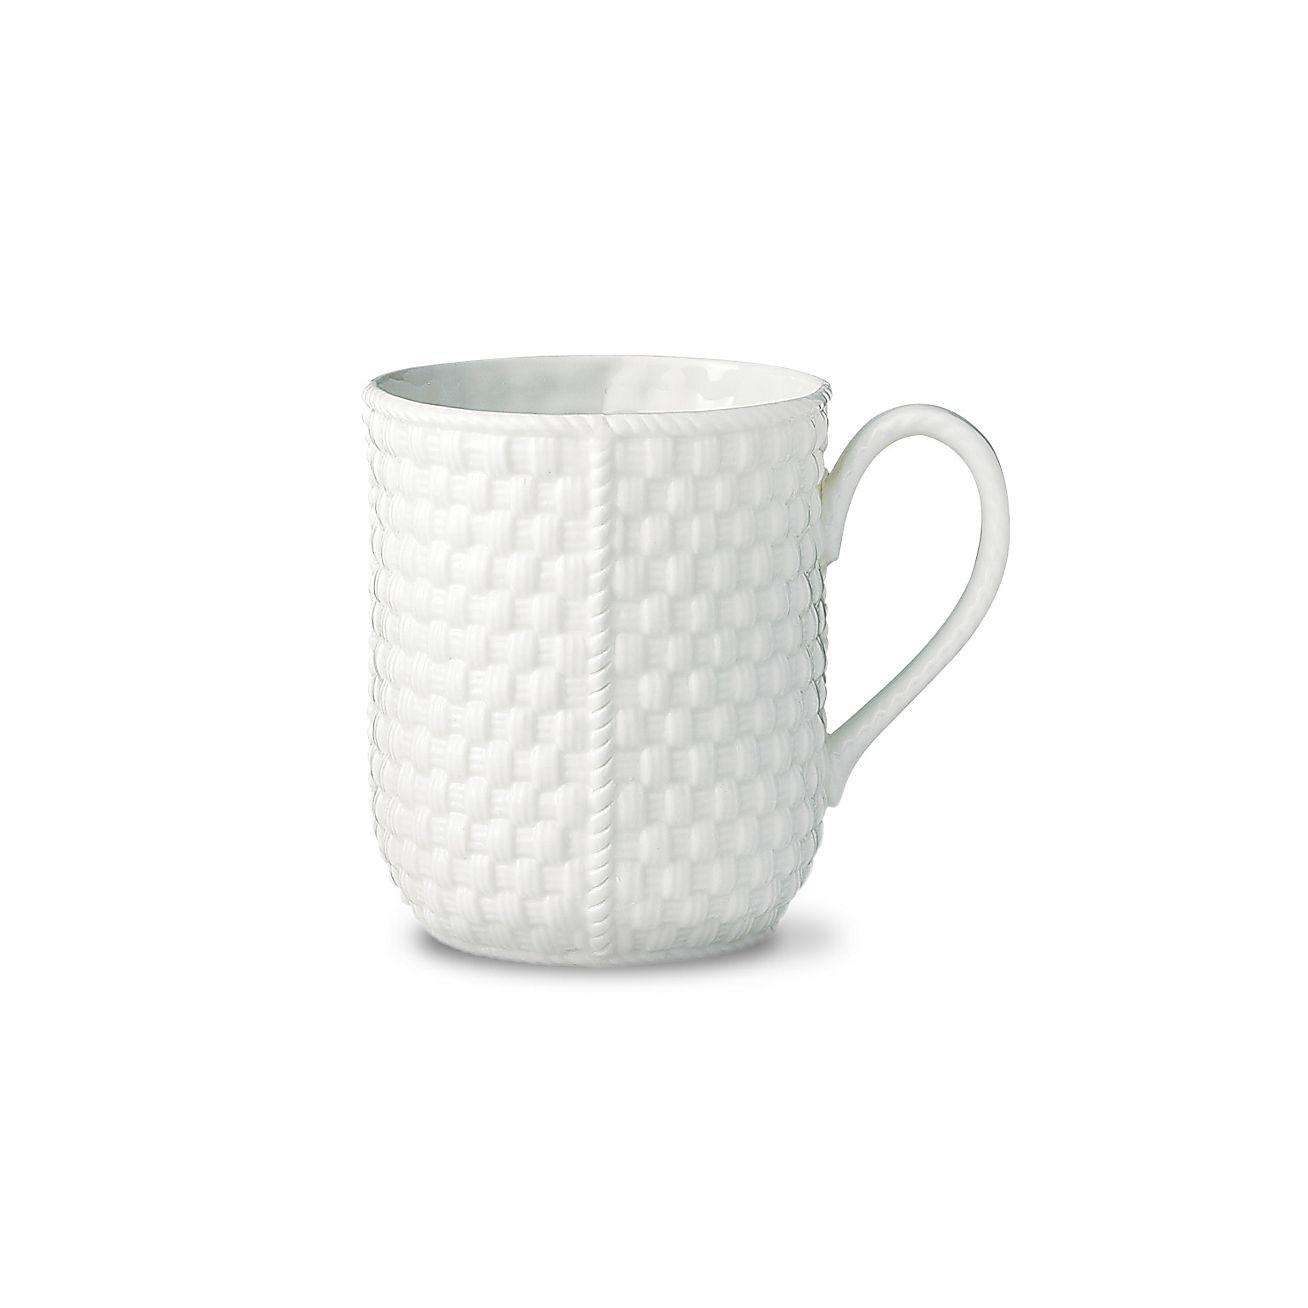 Tiffany Weave:Mug